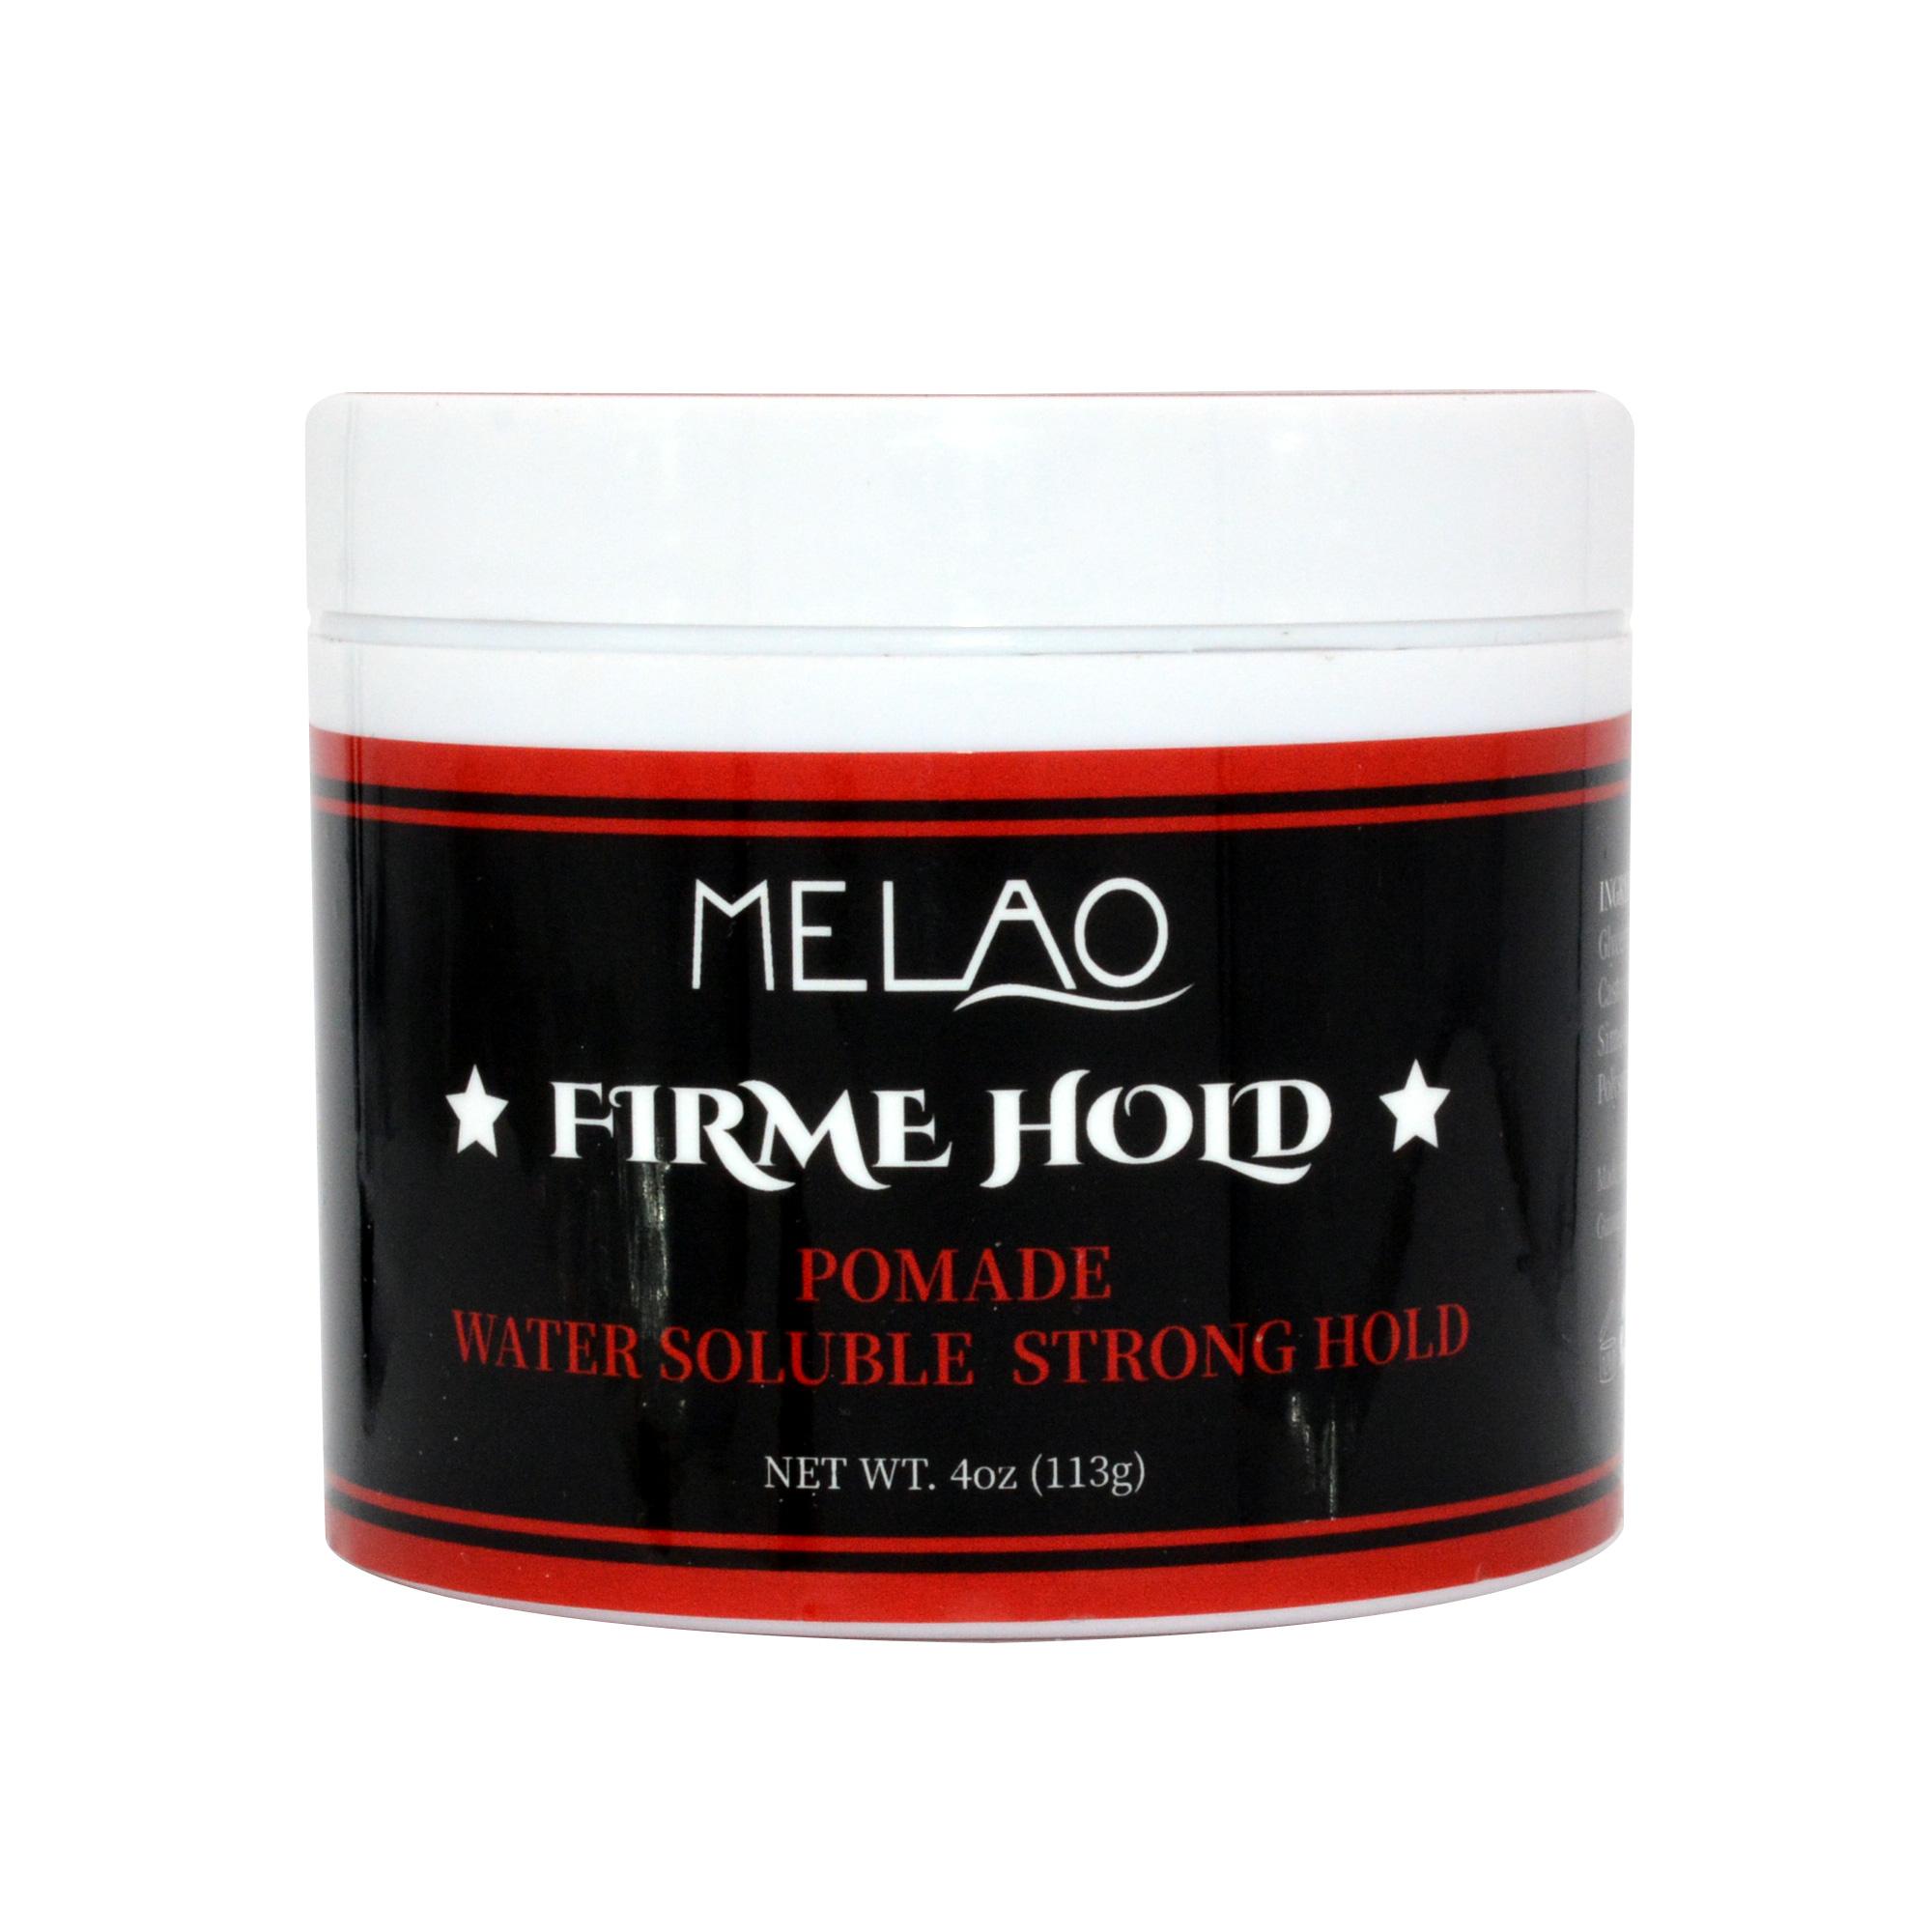 Hair Wax Pomade Styling Gel 113g For Men Perfume Shine Customize Oem Odm Bottle Anti Pcs Plastic Buy Hair Pomade Hair Wax Private Label Pomade Product On Alibaba Com